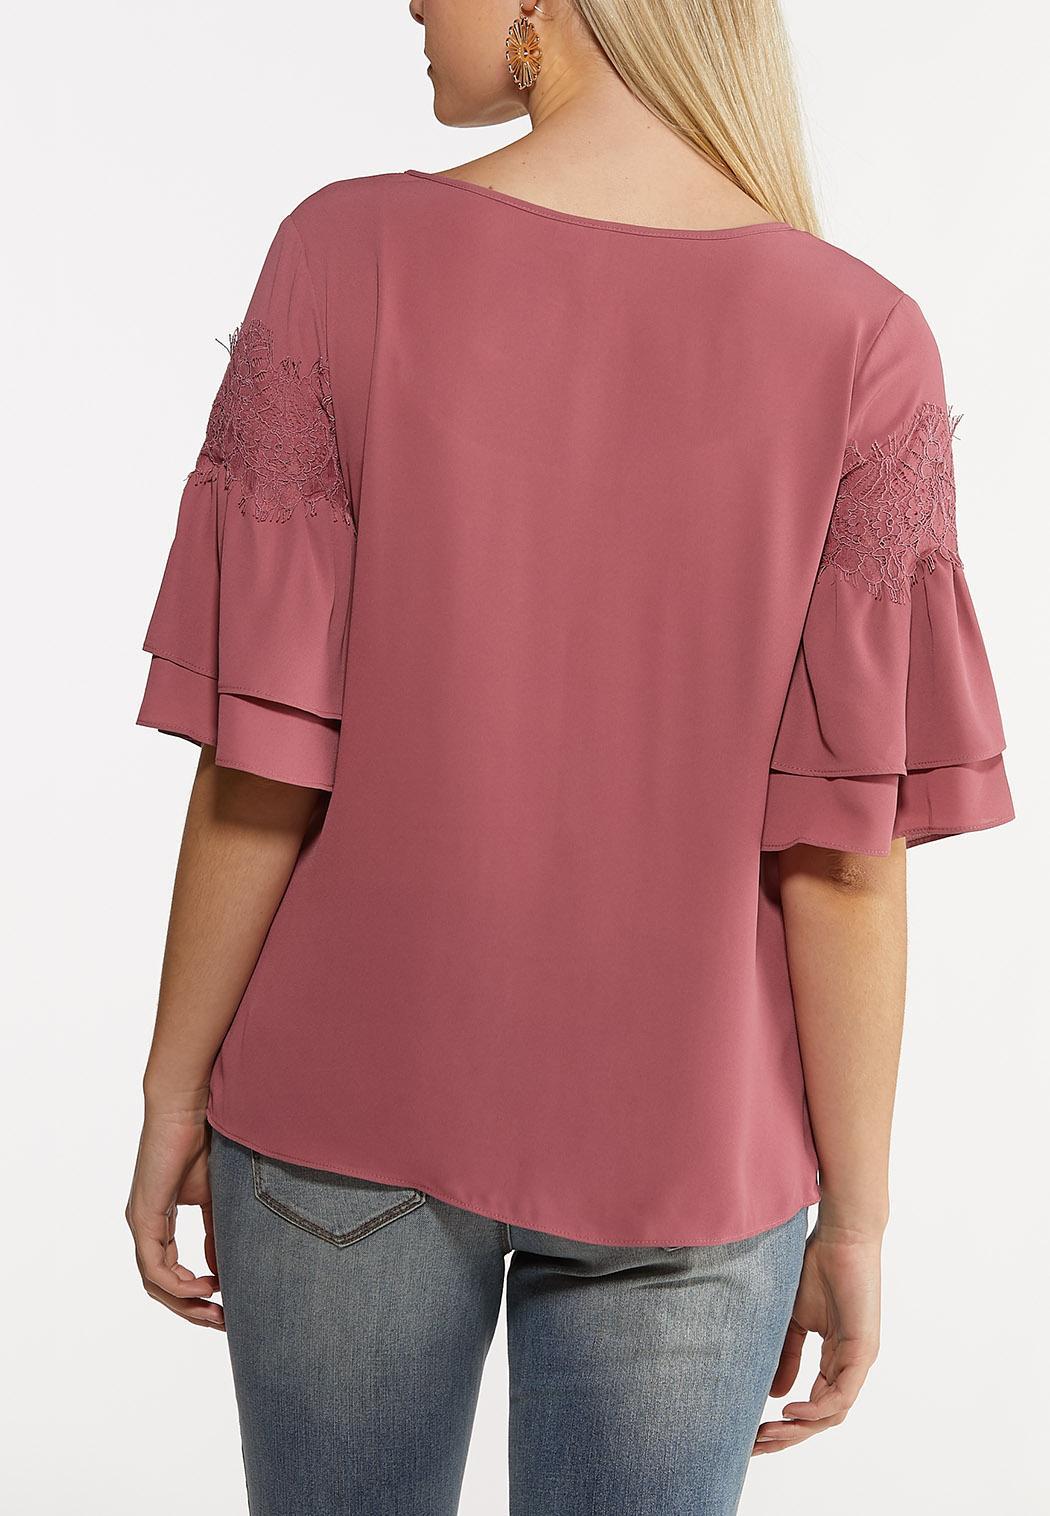 Ruffled Lace Sleeve Top (Item #44176326)